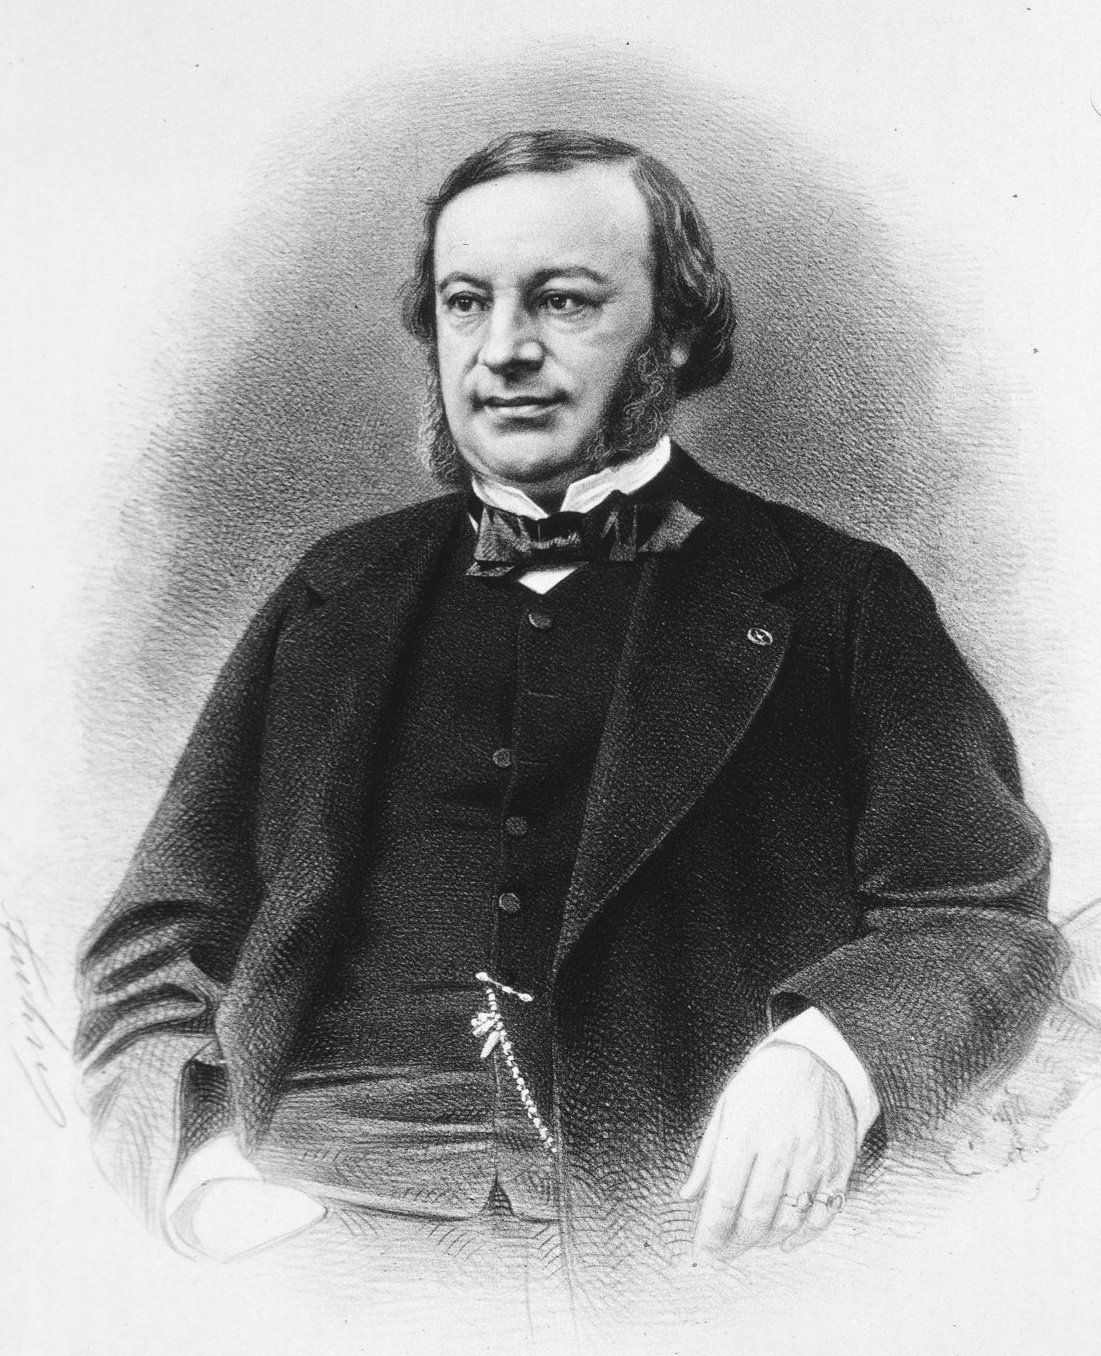 Auguste Ambroise Tardieu on Digital Work Devices